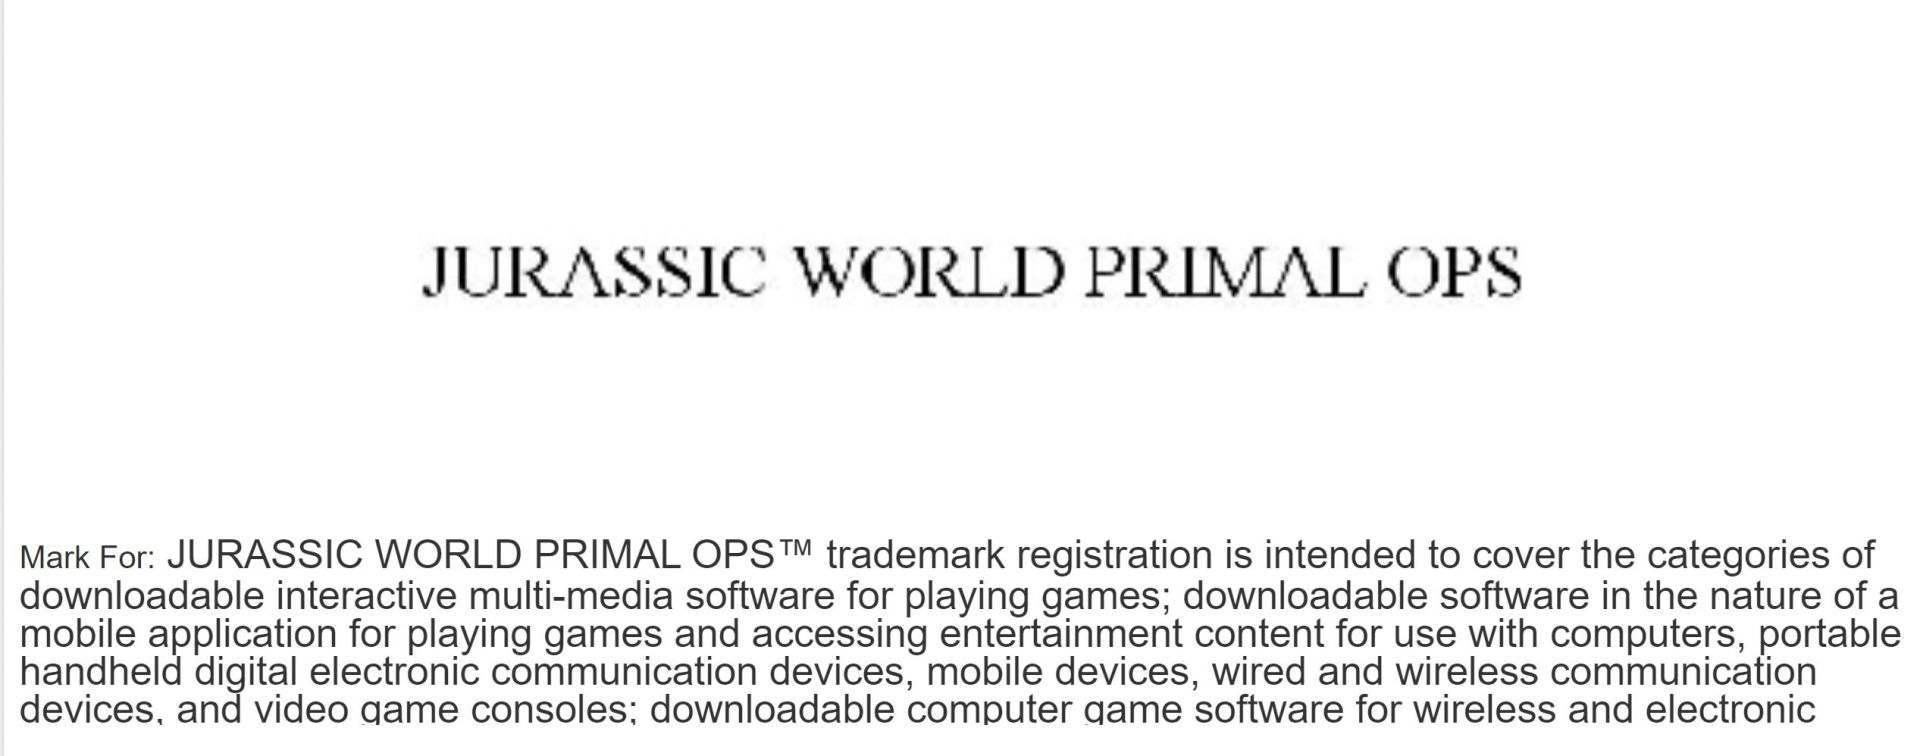 Jurassic World Primal Ops